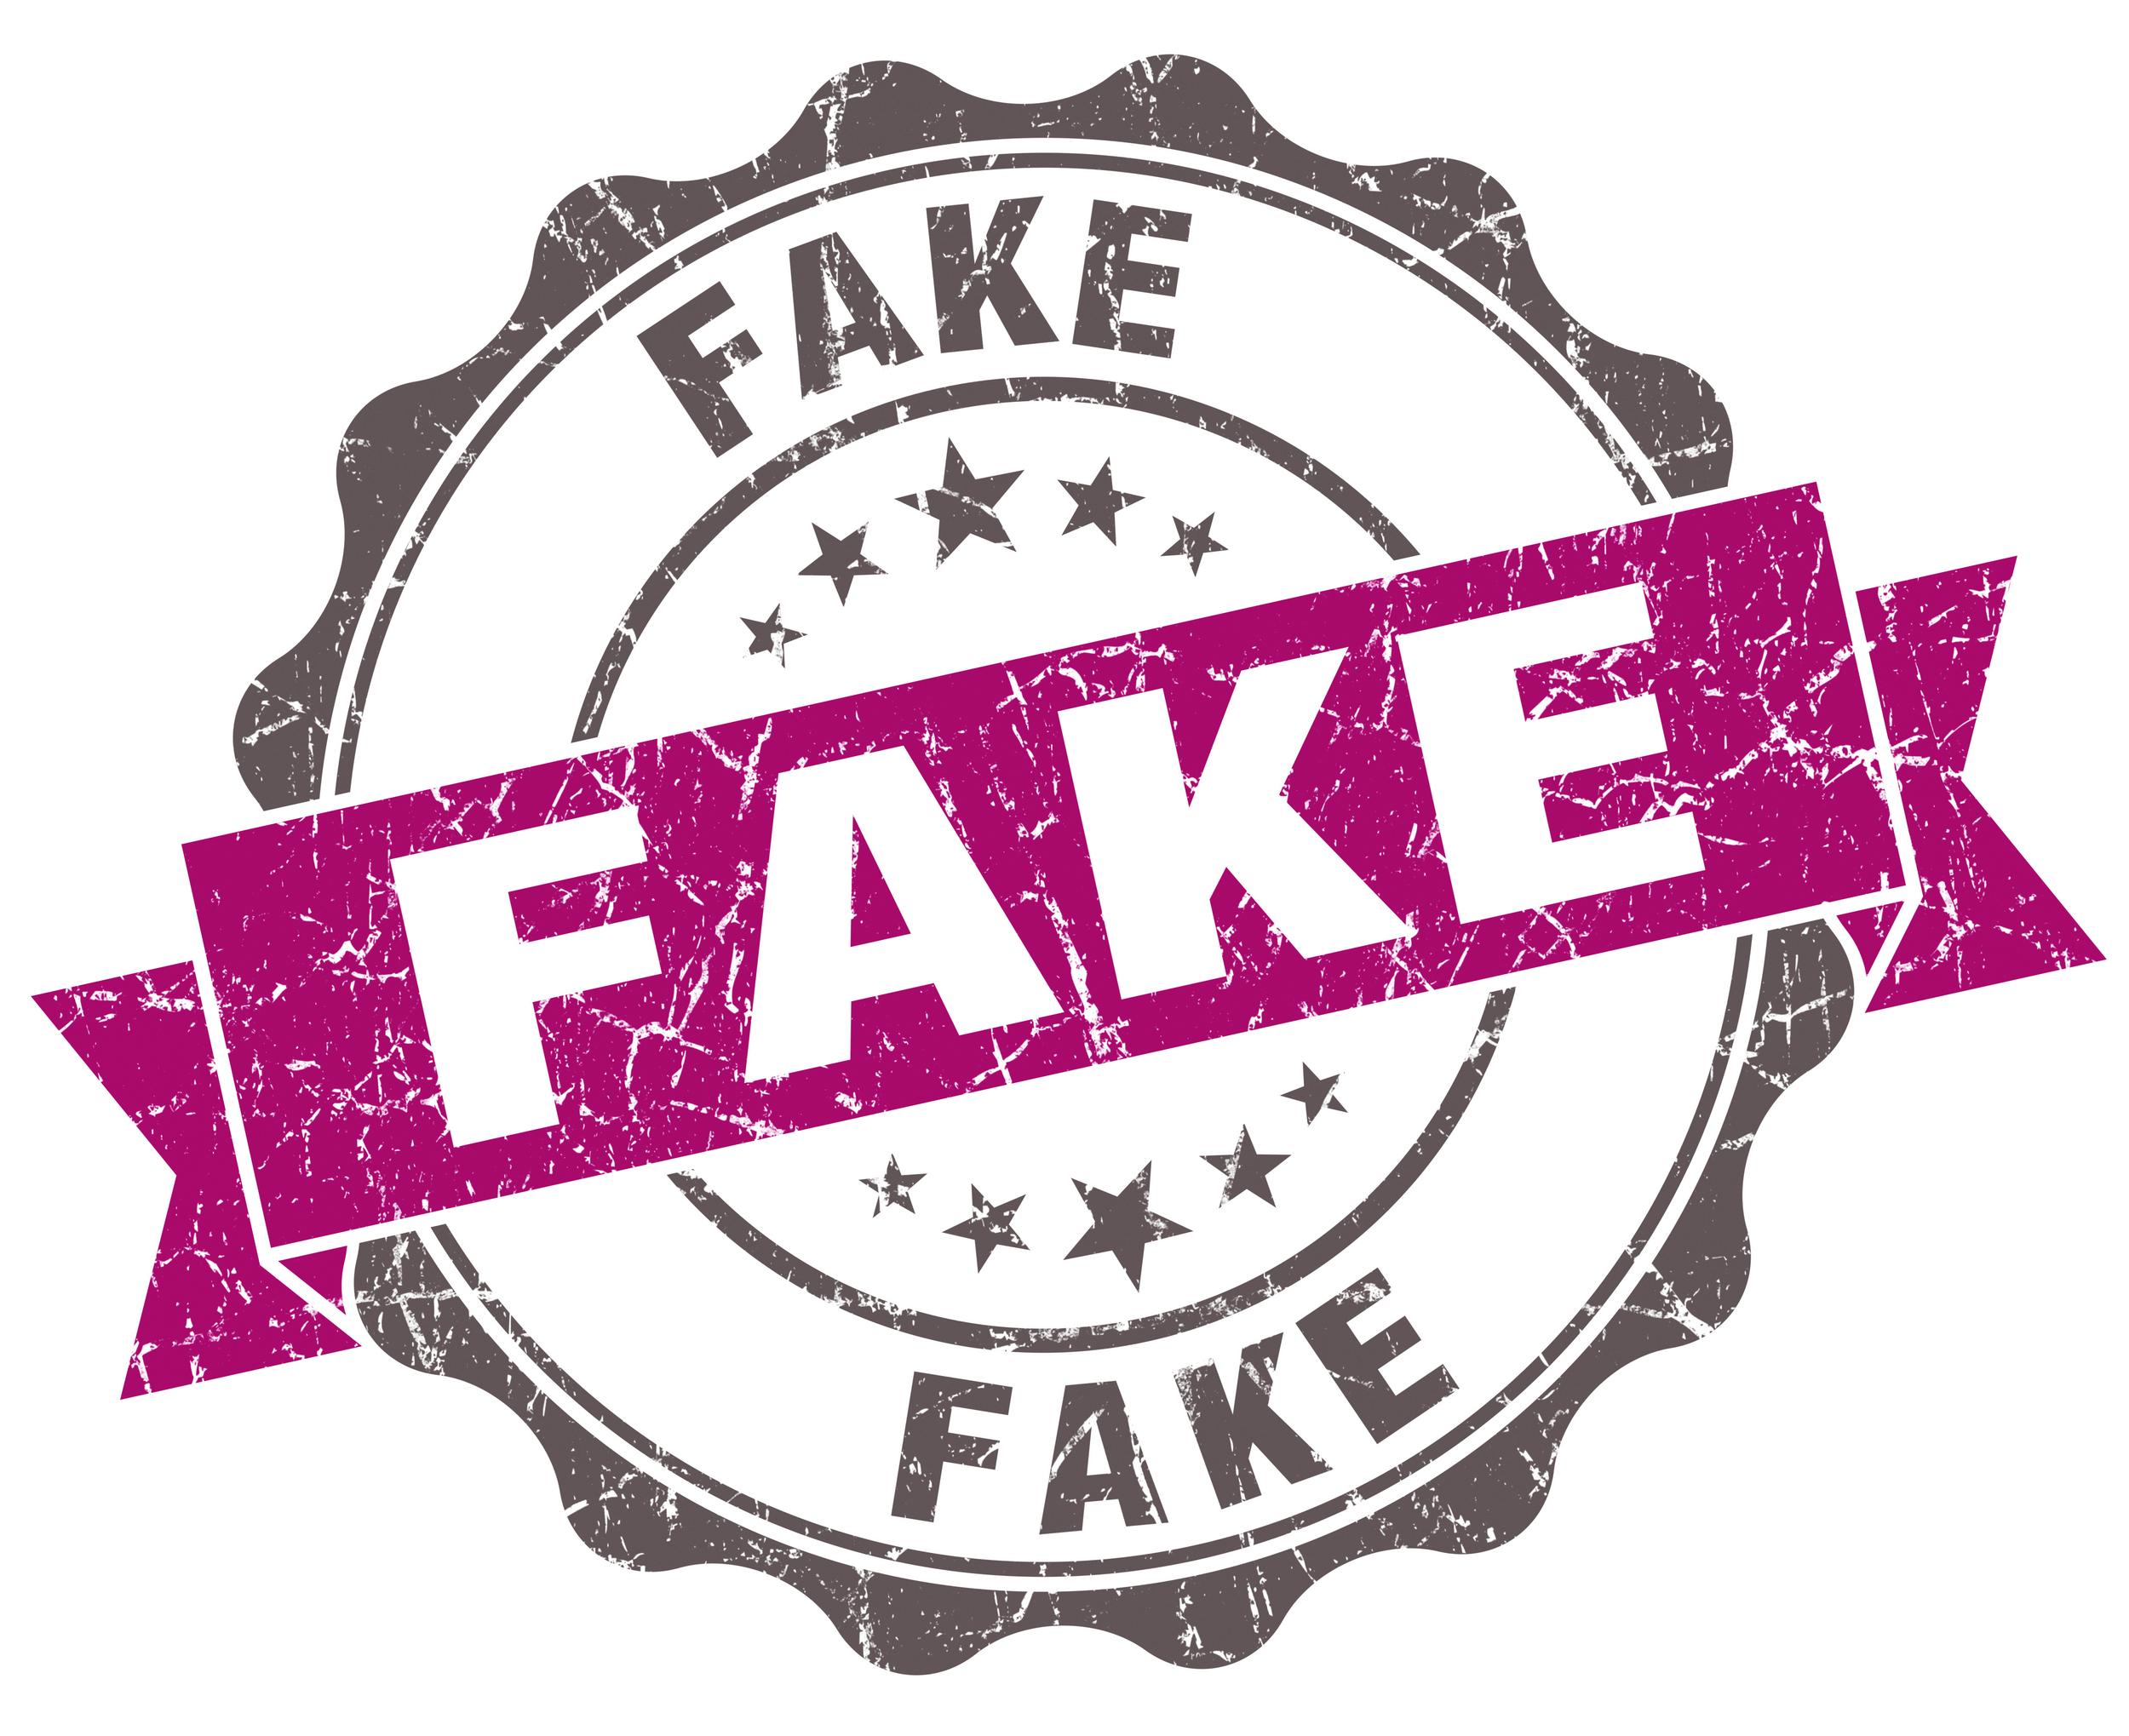 bigstock-Fake-Violet-Grunge-Retro-Vinta-63040222.jpg